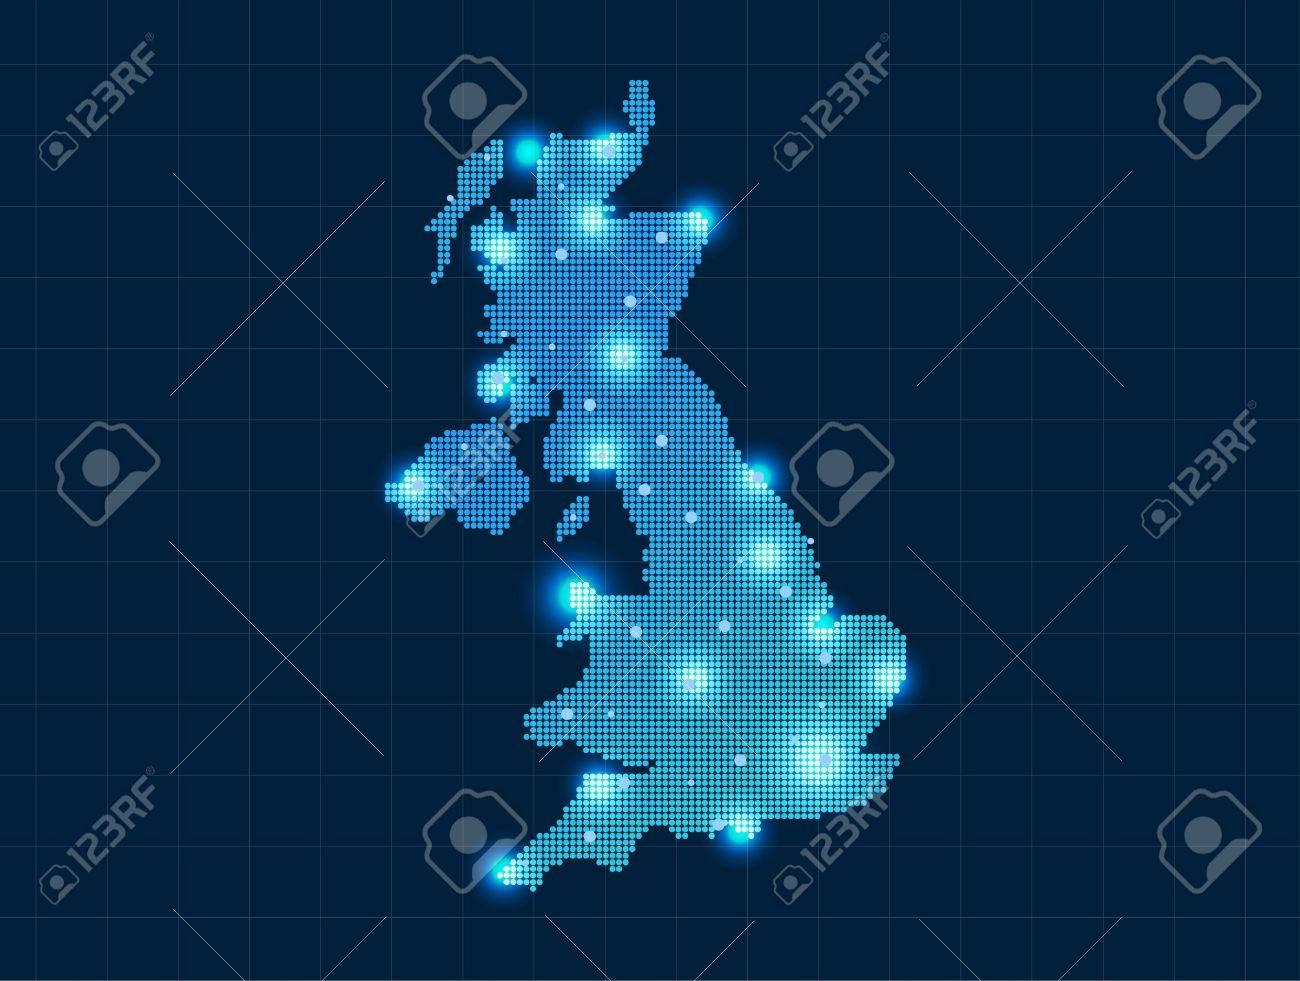 pixel united kingdom map - 20367124